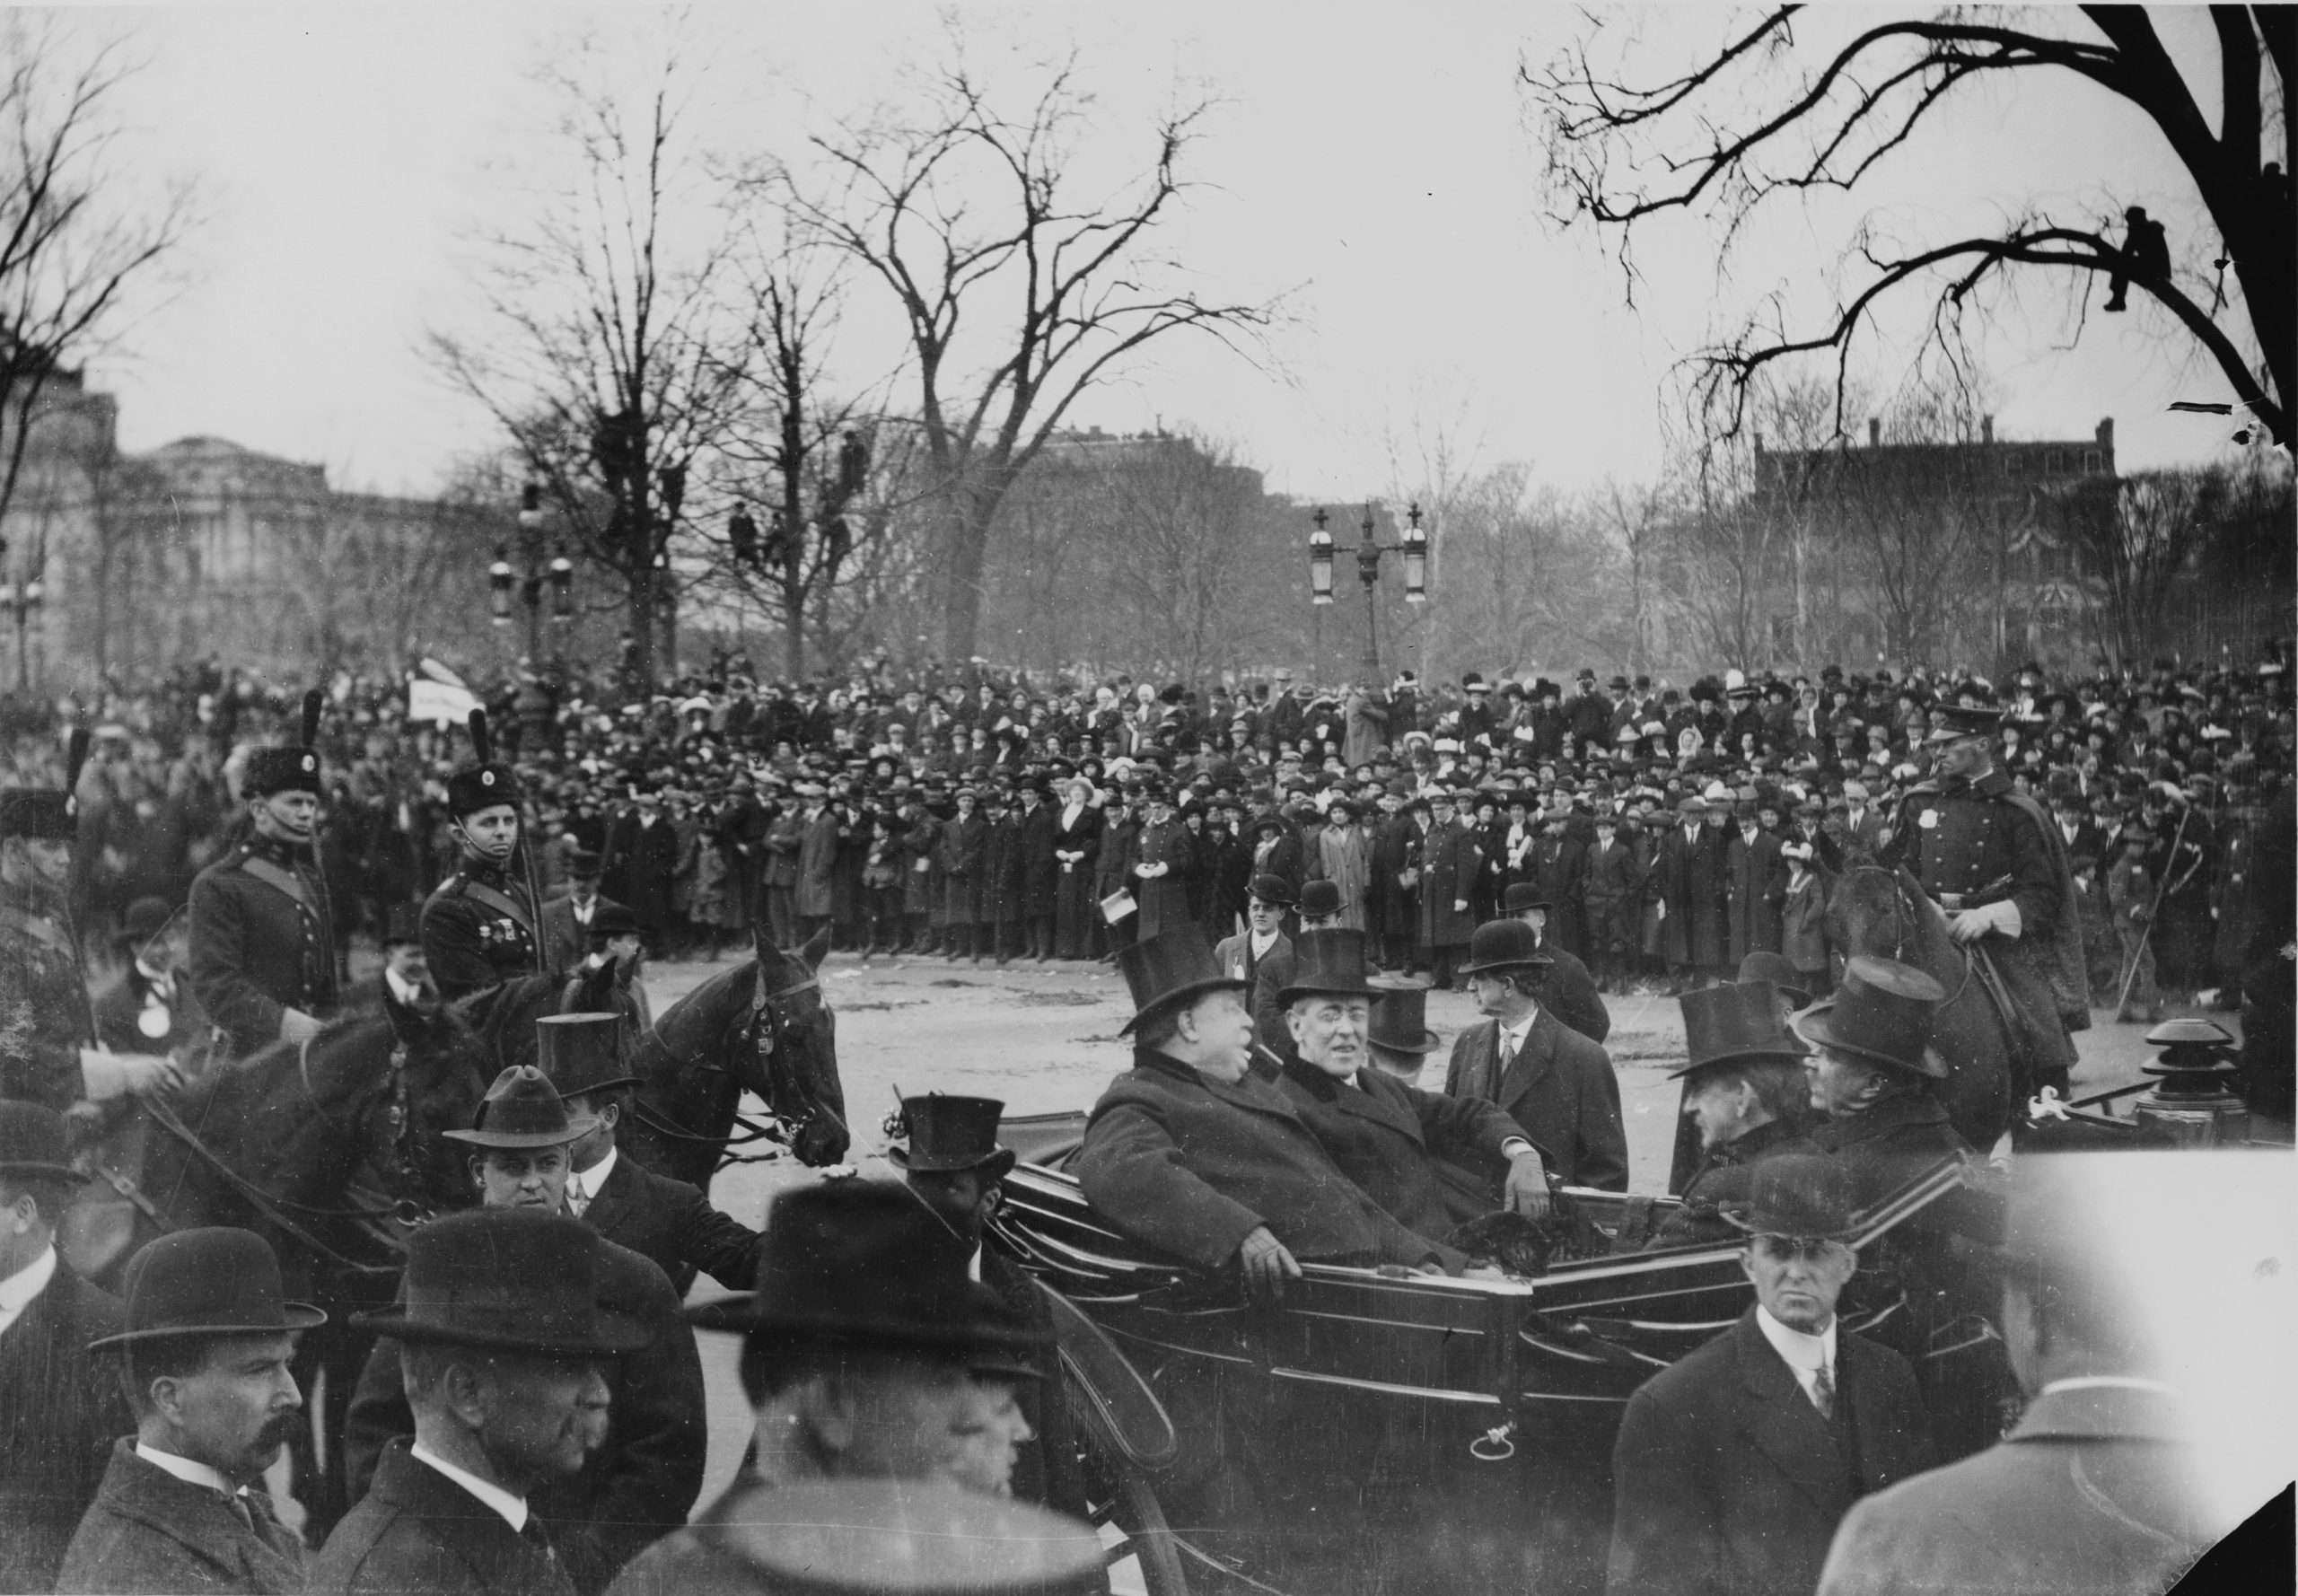 Woodrow Wilson's 1913 Inaugural Procession